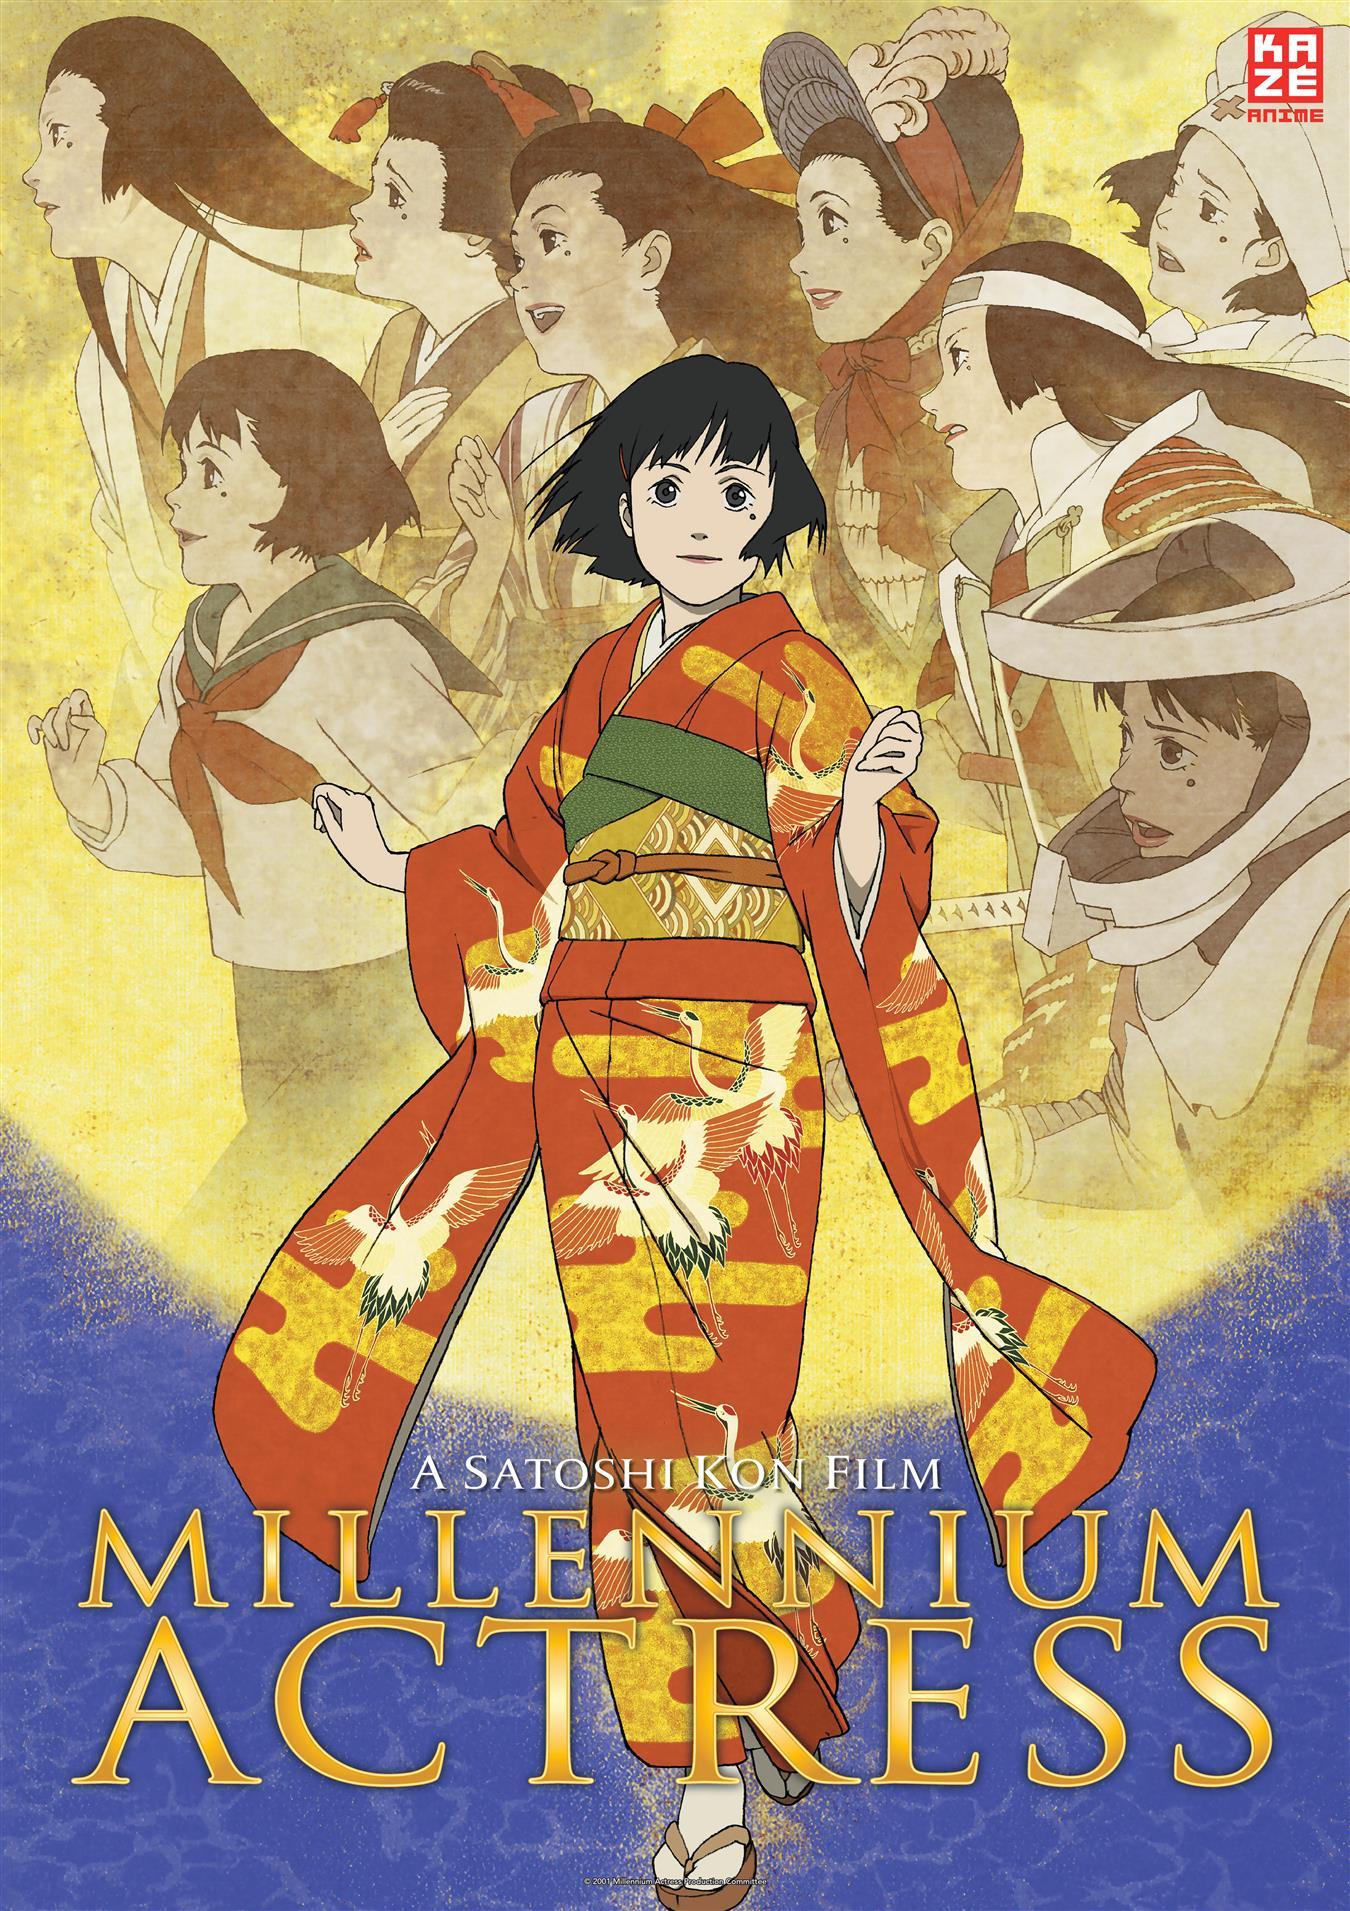 Anime Night - Millennium Actress